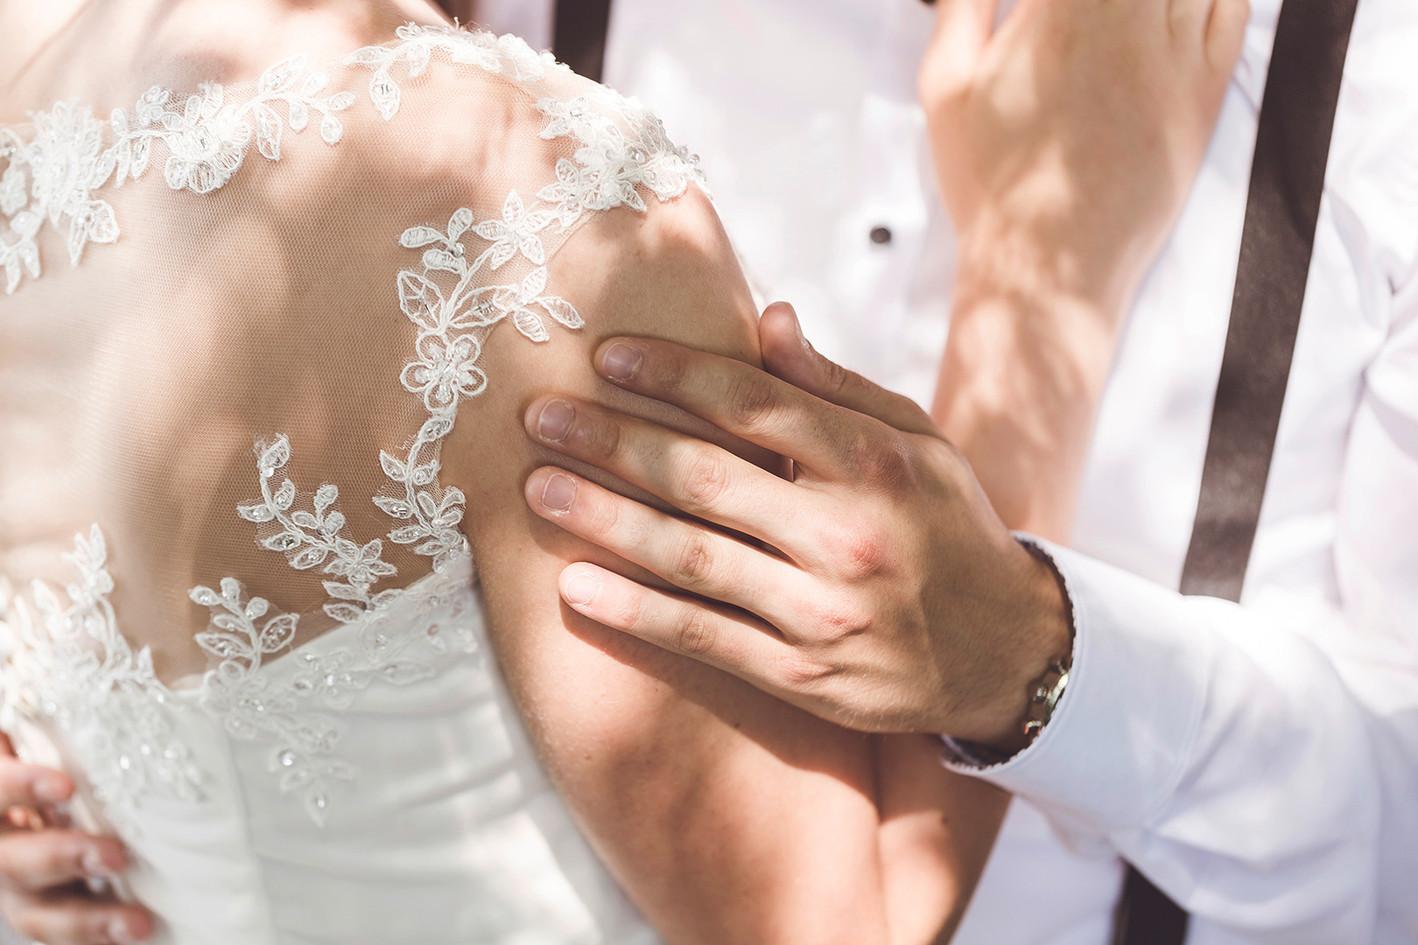 018-married-united-wedding-suephotoart-p